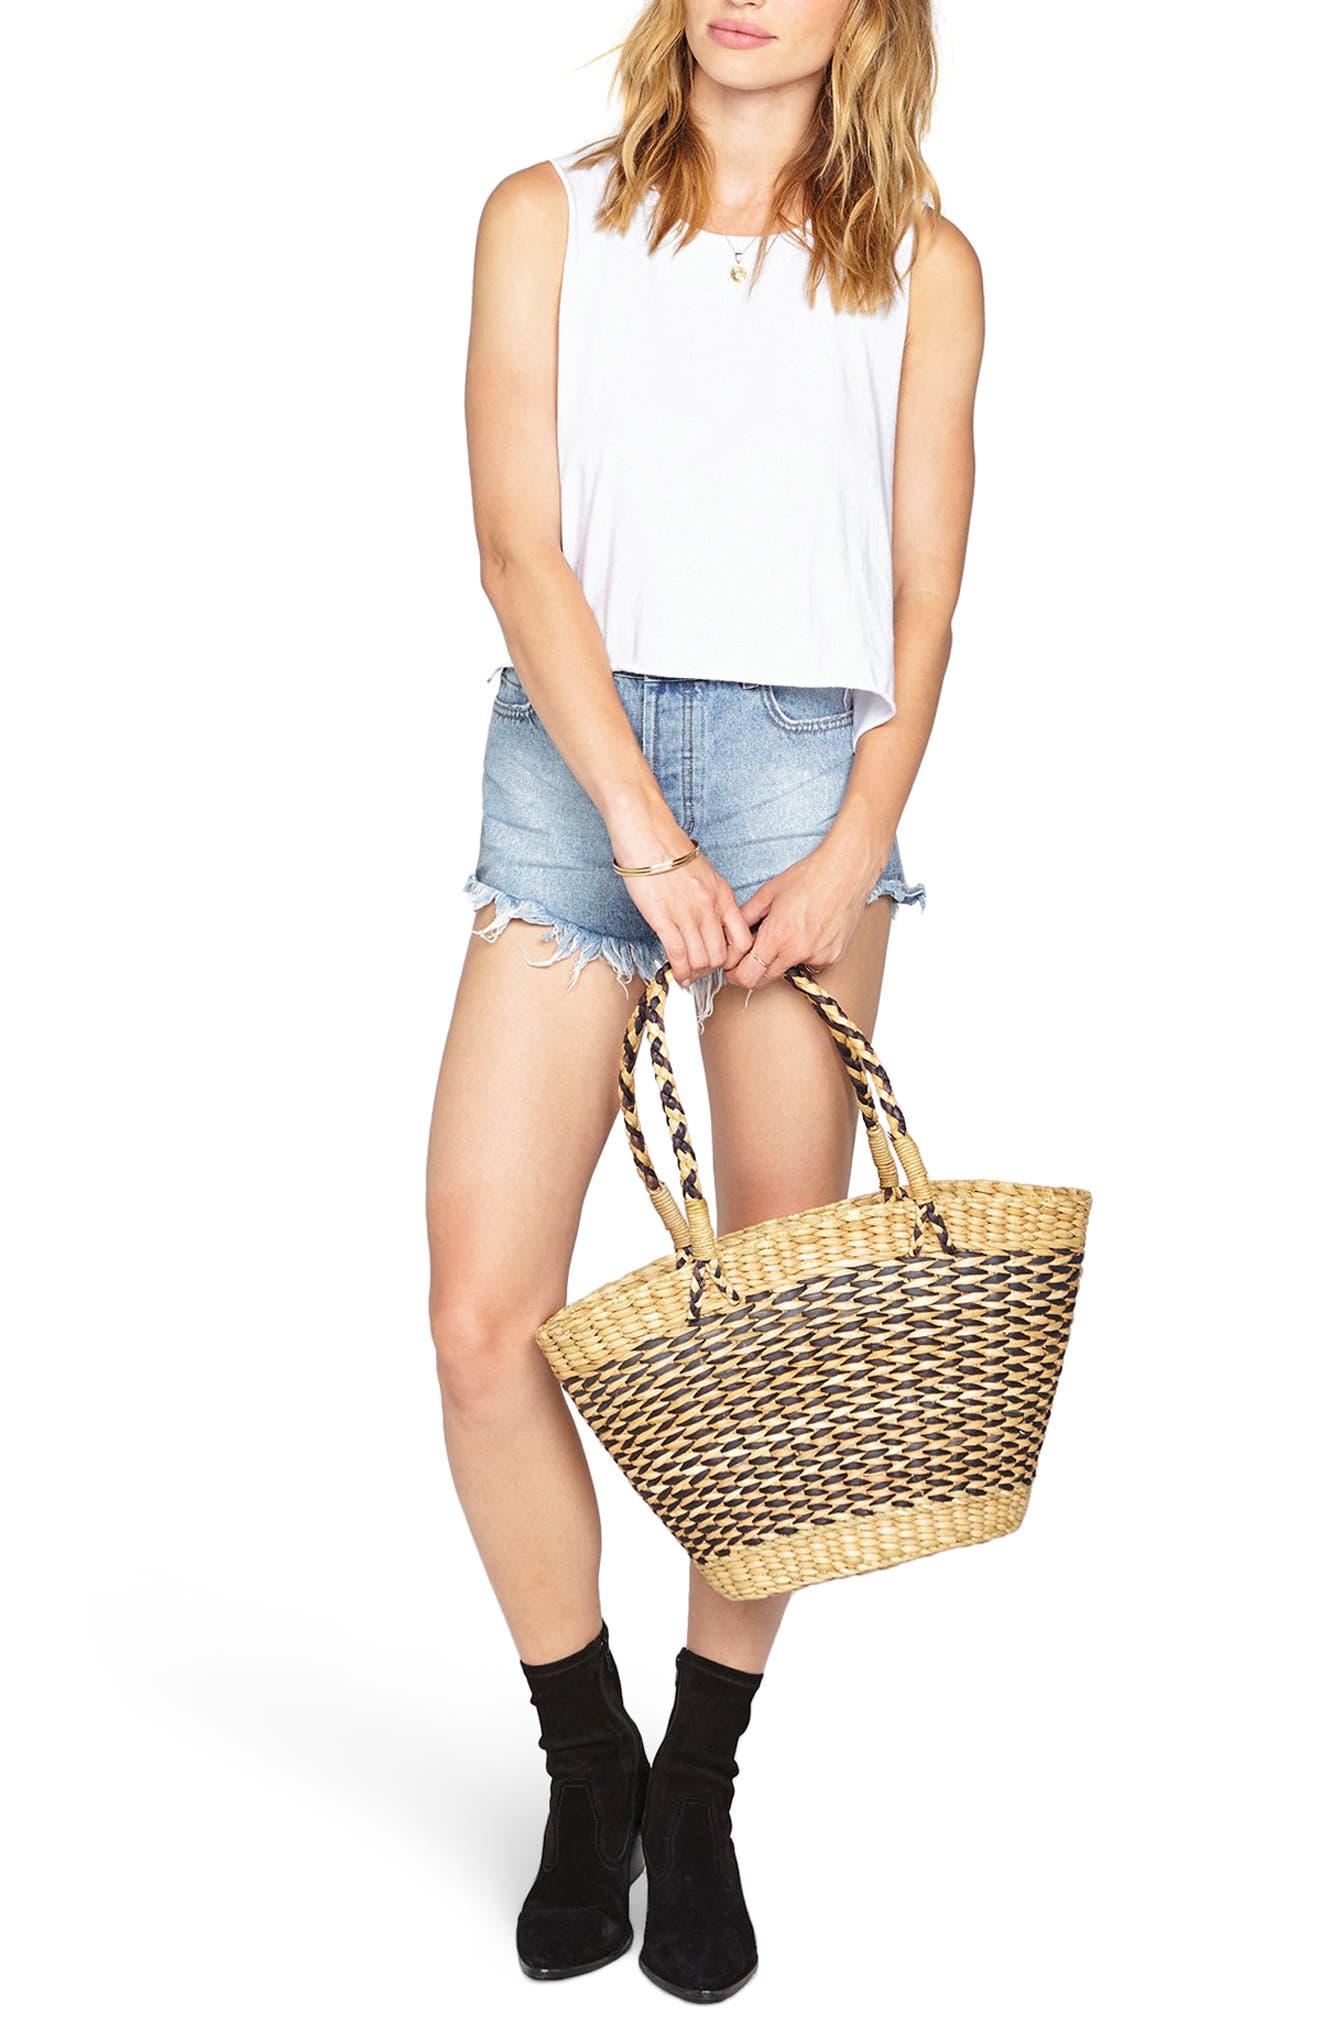 Goodie Basket Straw Tote,                             Alternate thumbnail 2, color,                             001